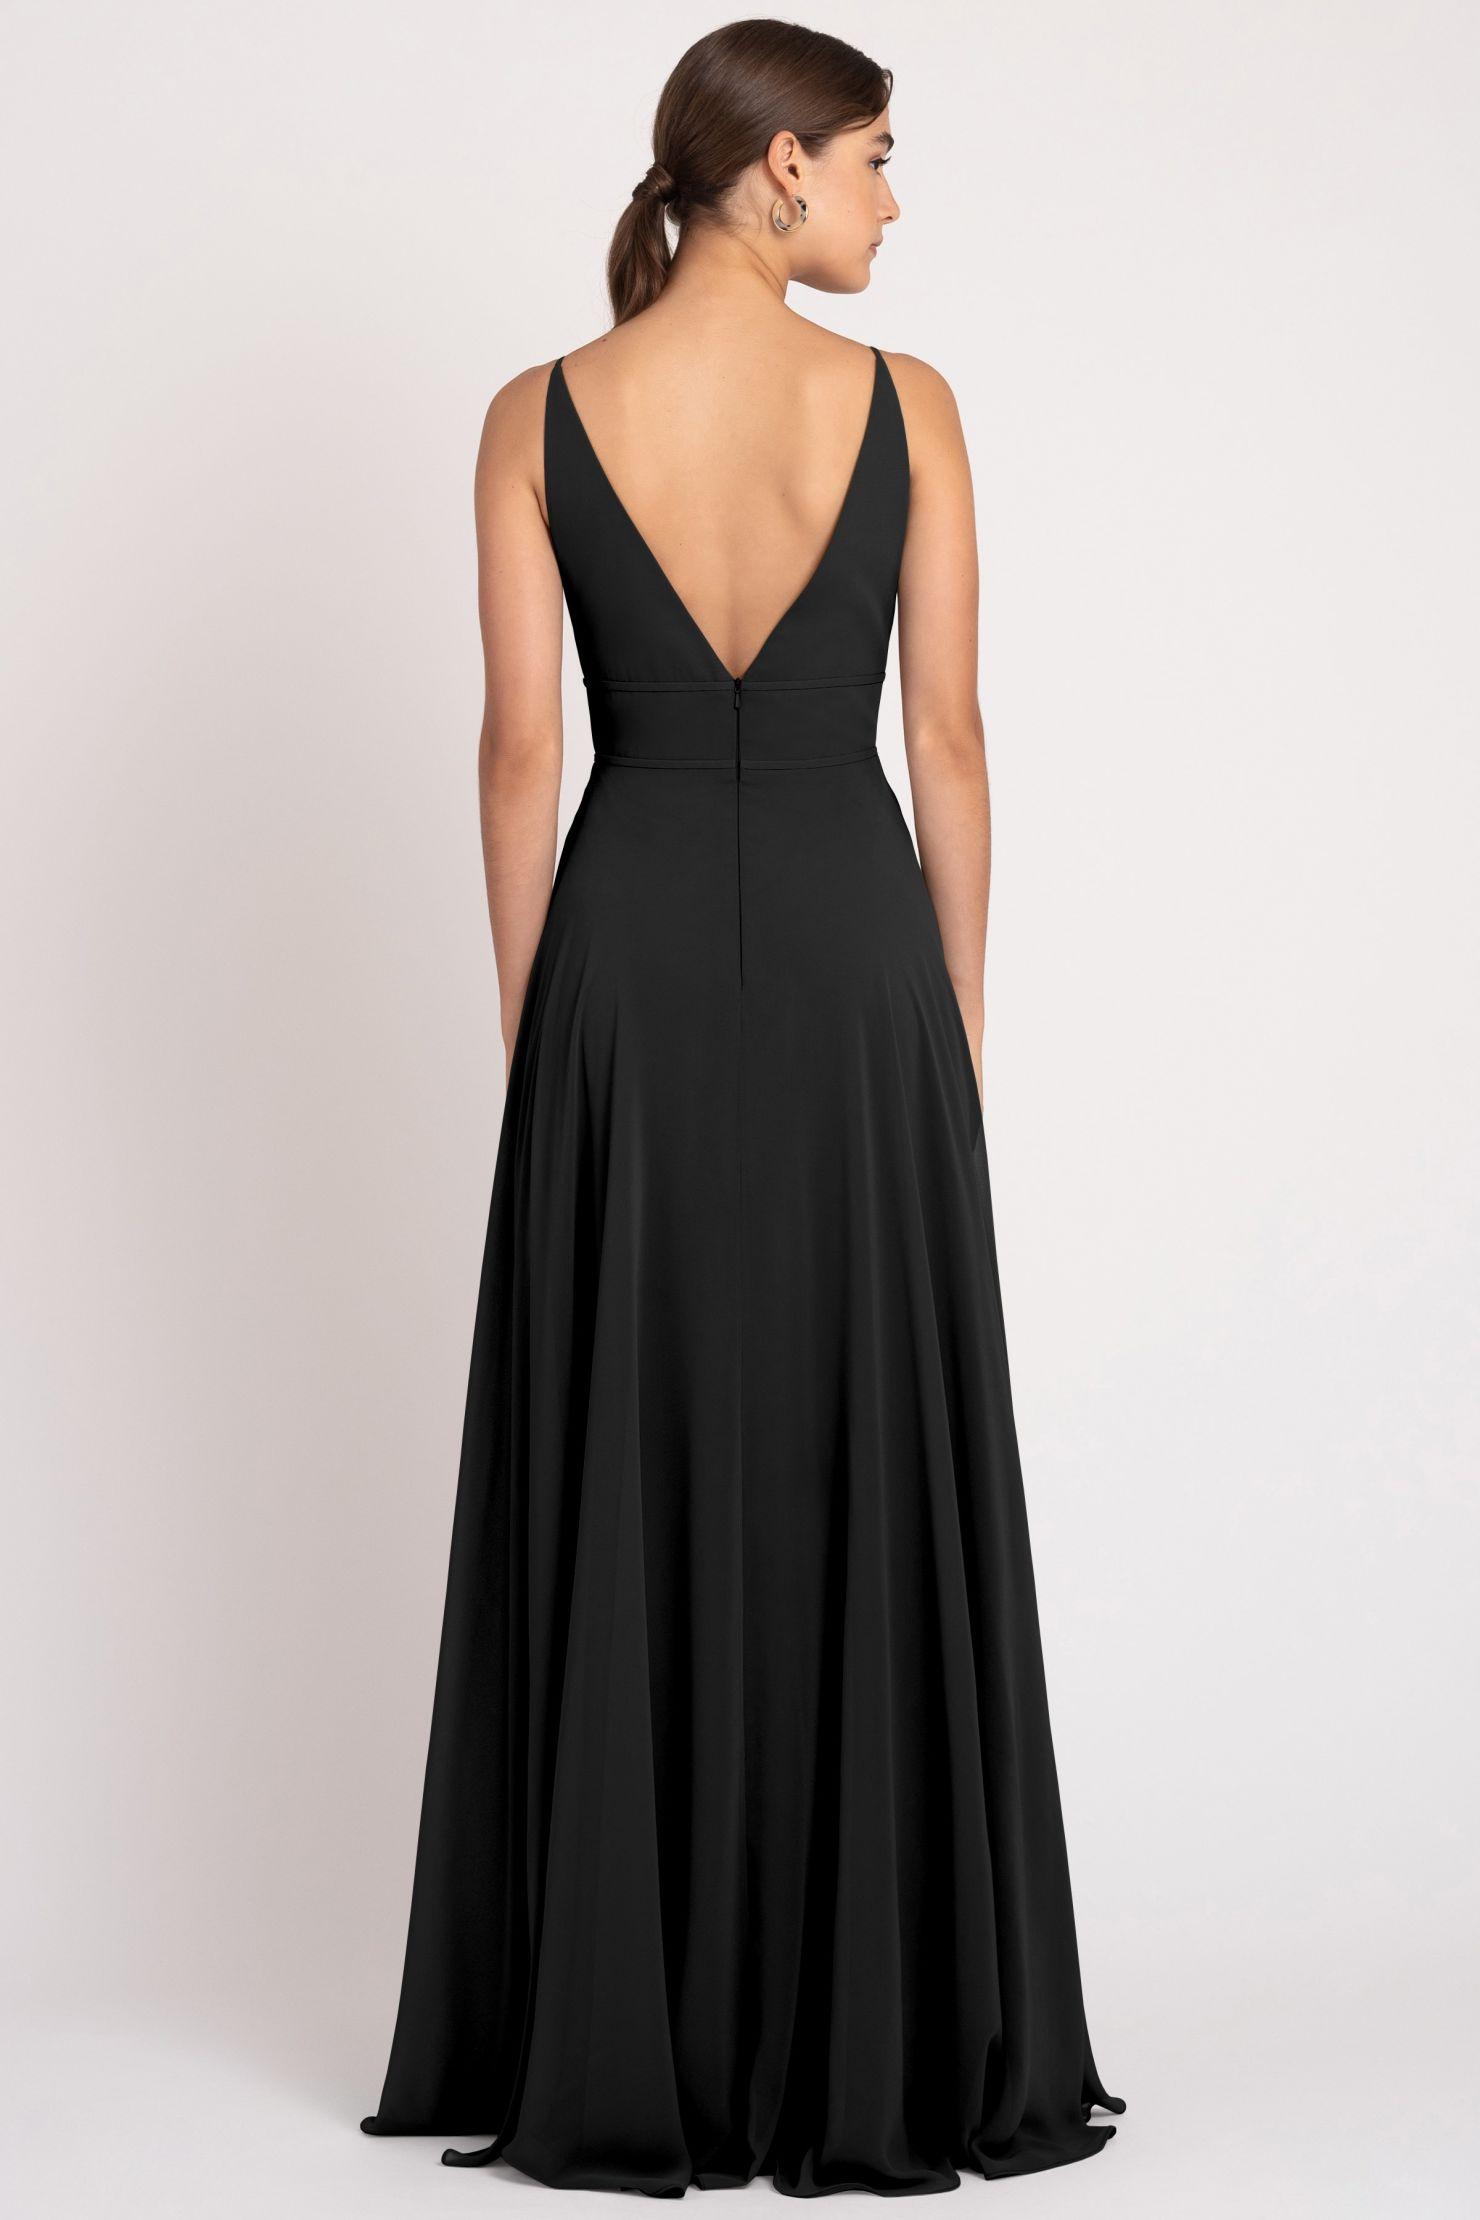 Hollis Bridesmaids Dress by Jenny Yoo - Black